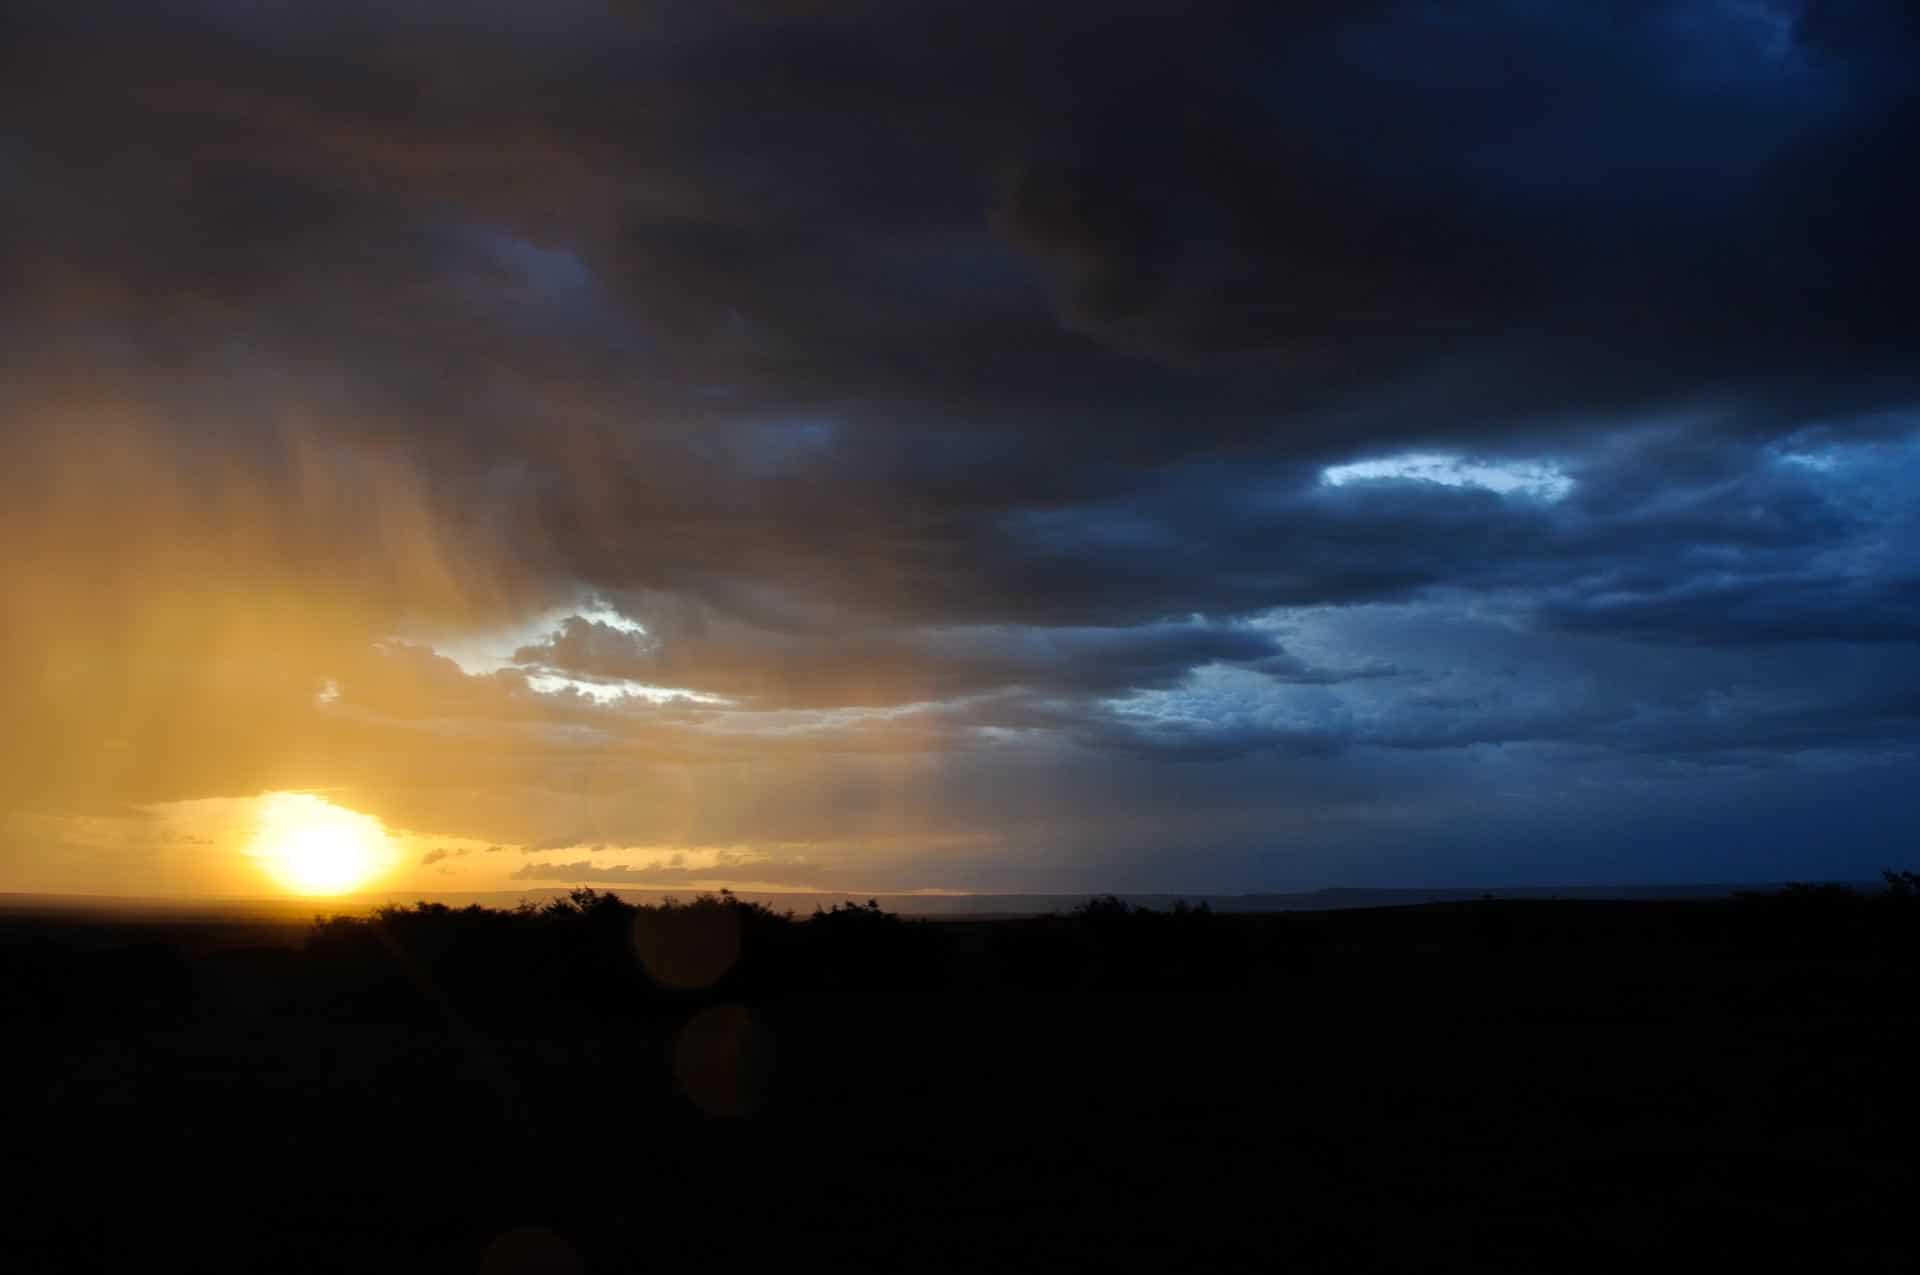 Masai-Mara-Kenia-Globetrotter-Select-15